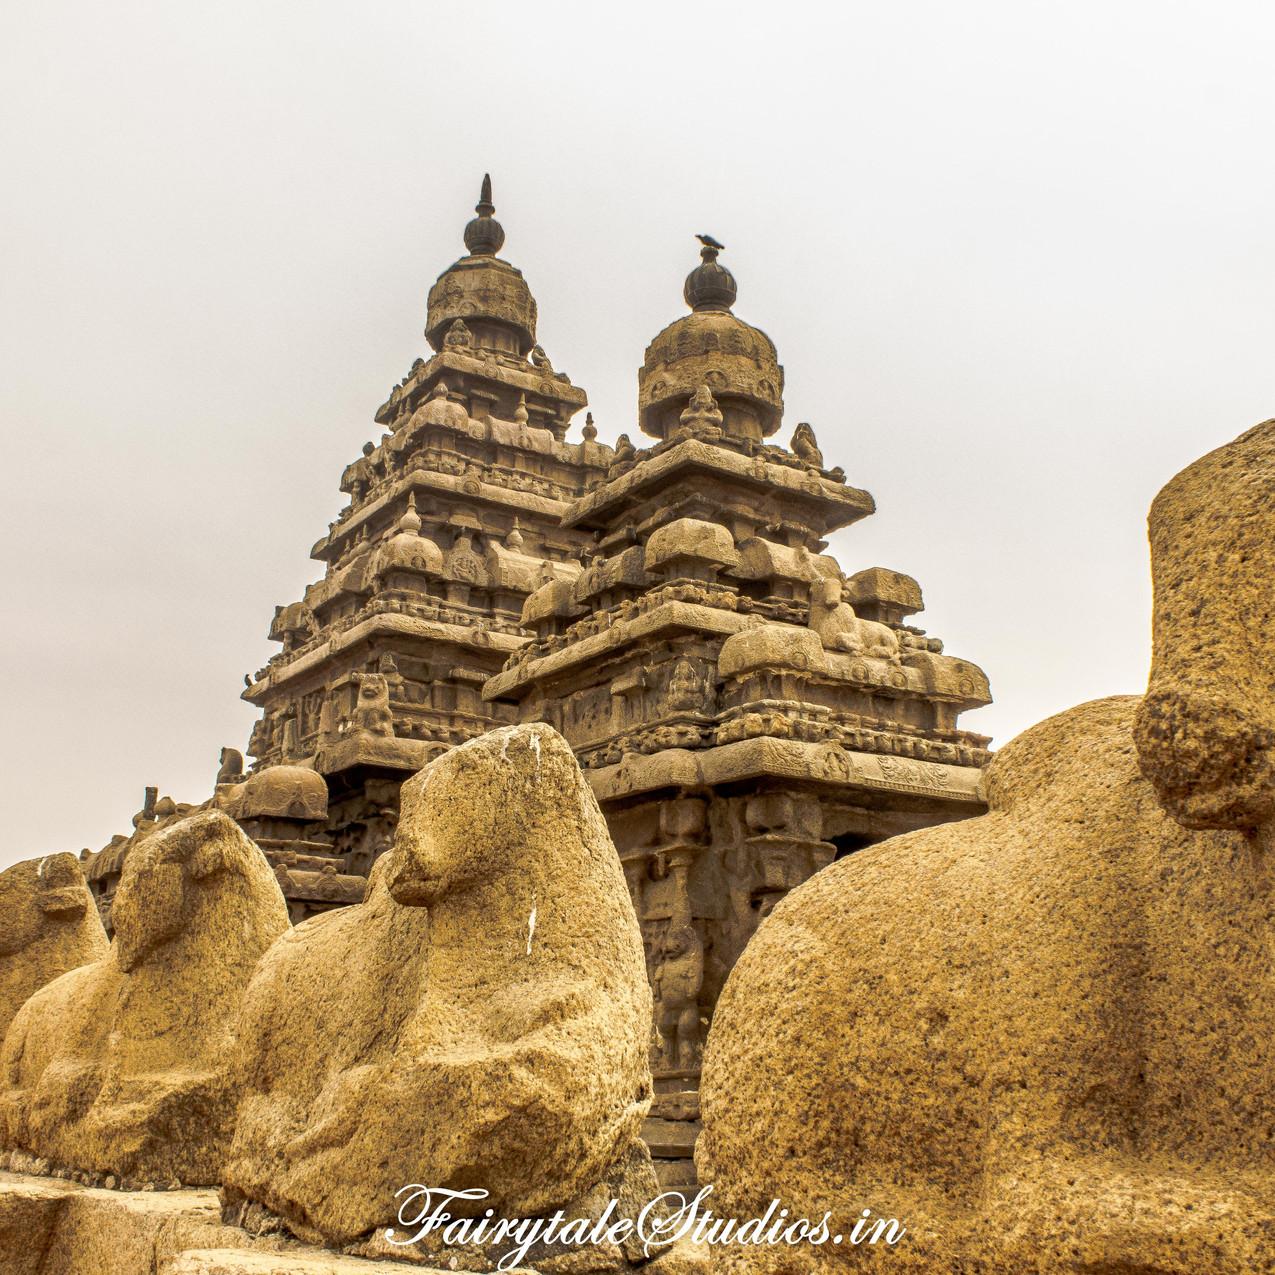 Seashore Temple_Mahabalipuram_Fairytale Travel Blog (4)